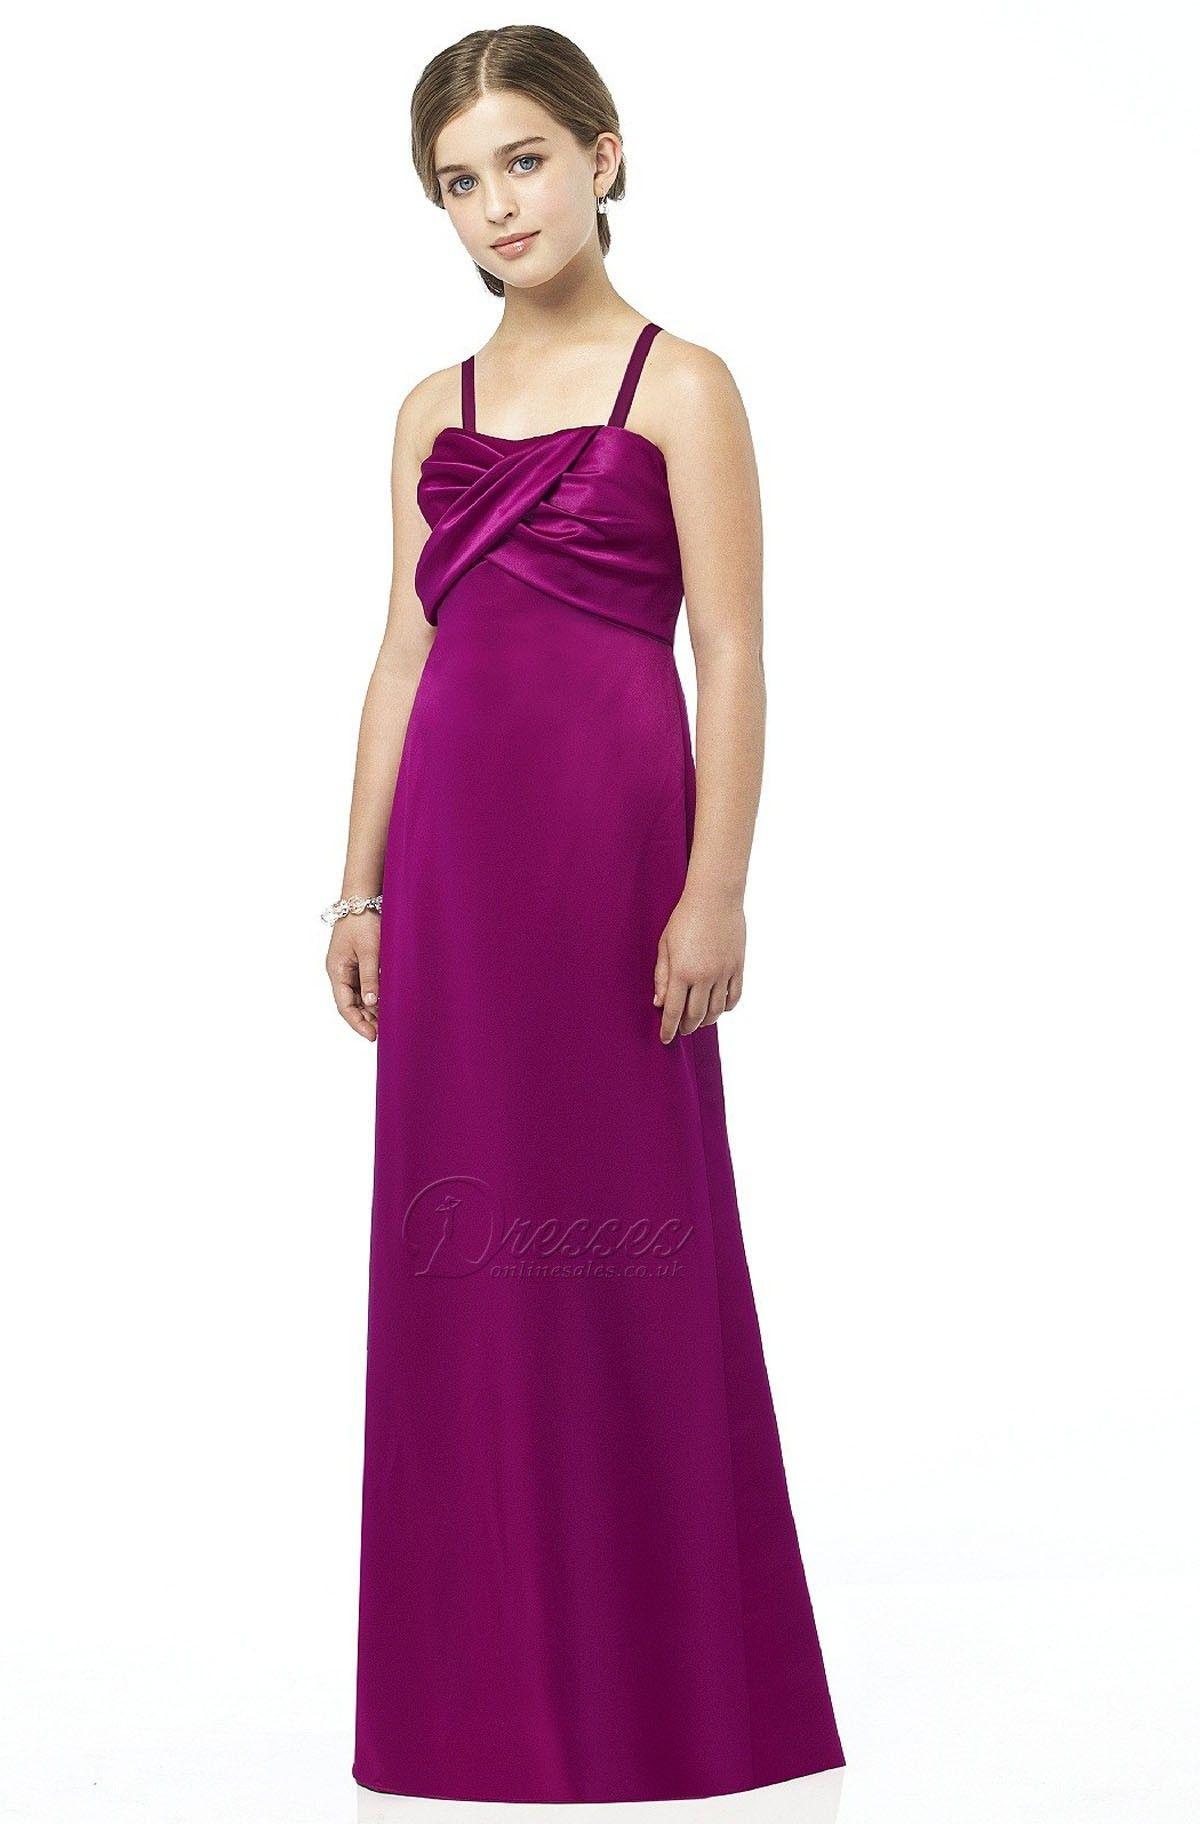 kids junior prom dress | Dresses | Pinterest